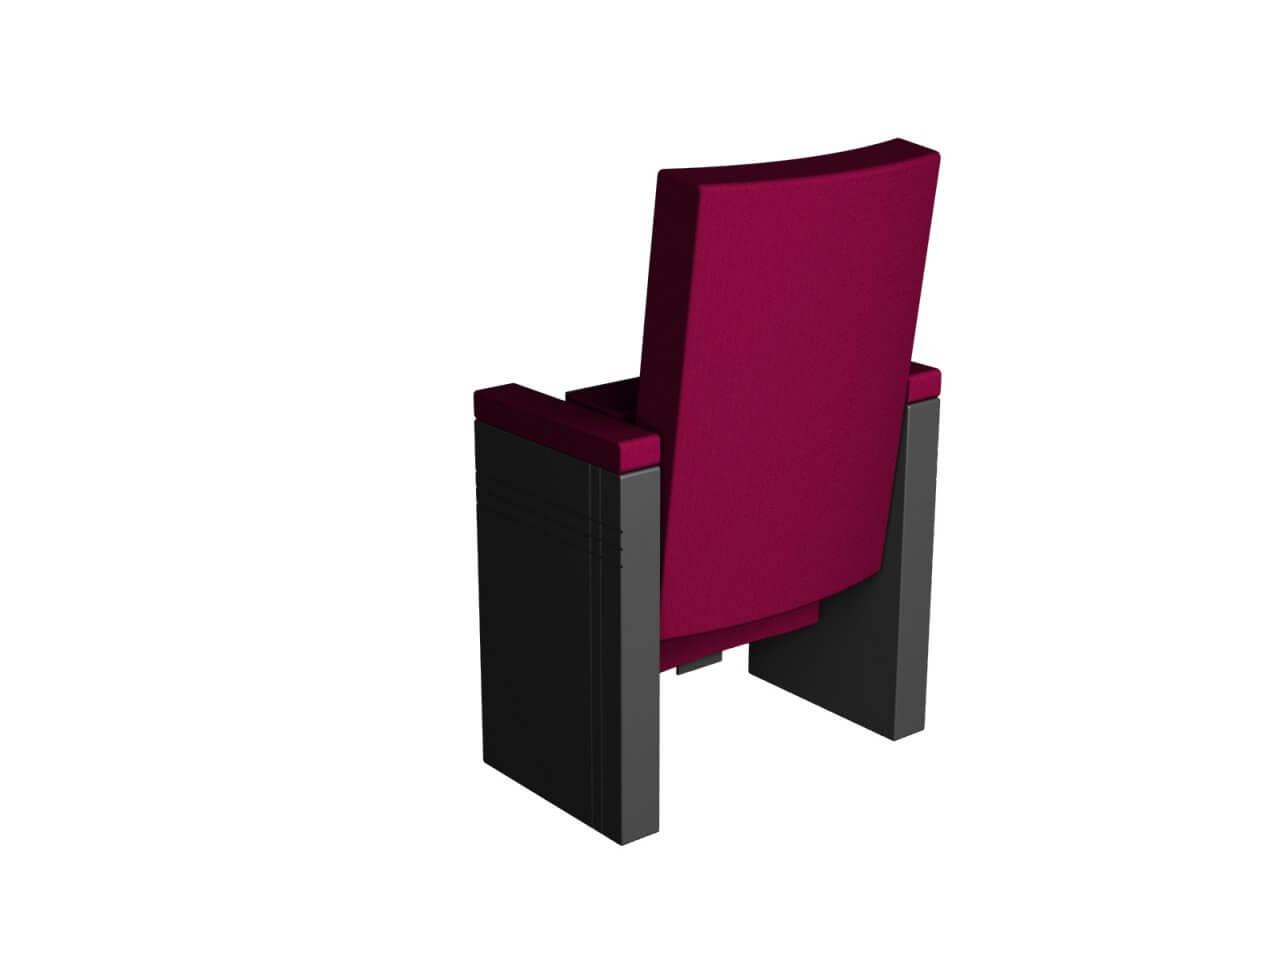 Kleslo - skéné- Leader de fabrication de fauteuils cinéma, théâtre ...skéné v3